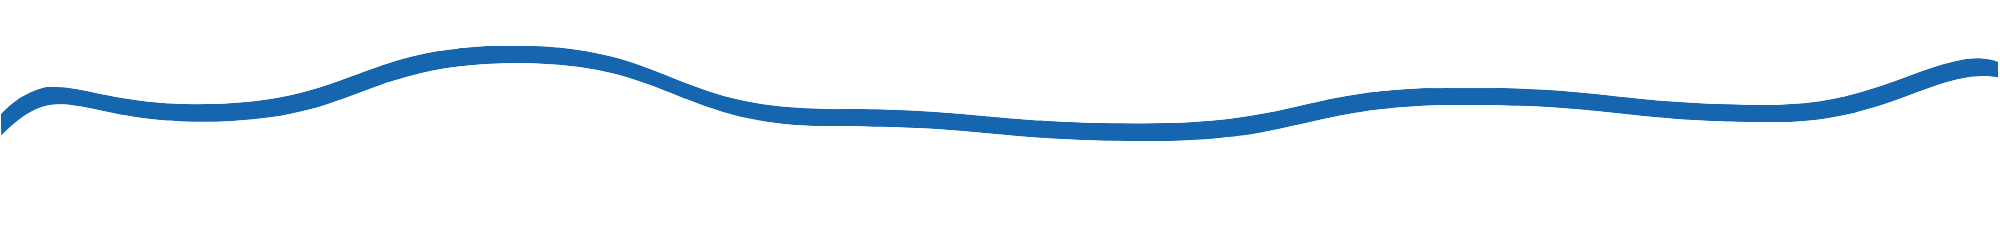 Blue_Line_Transparent.png